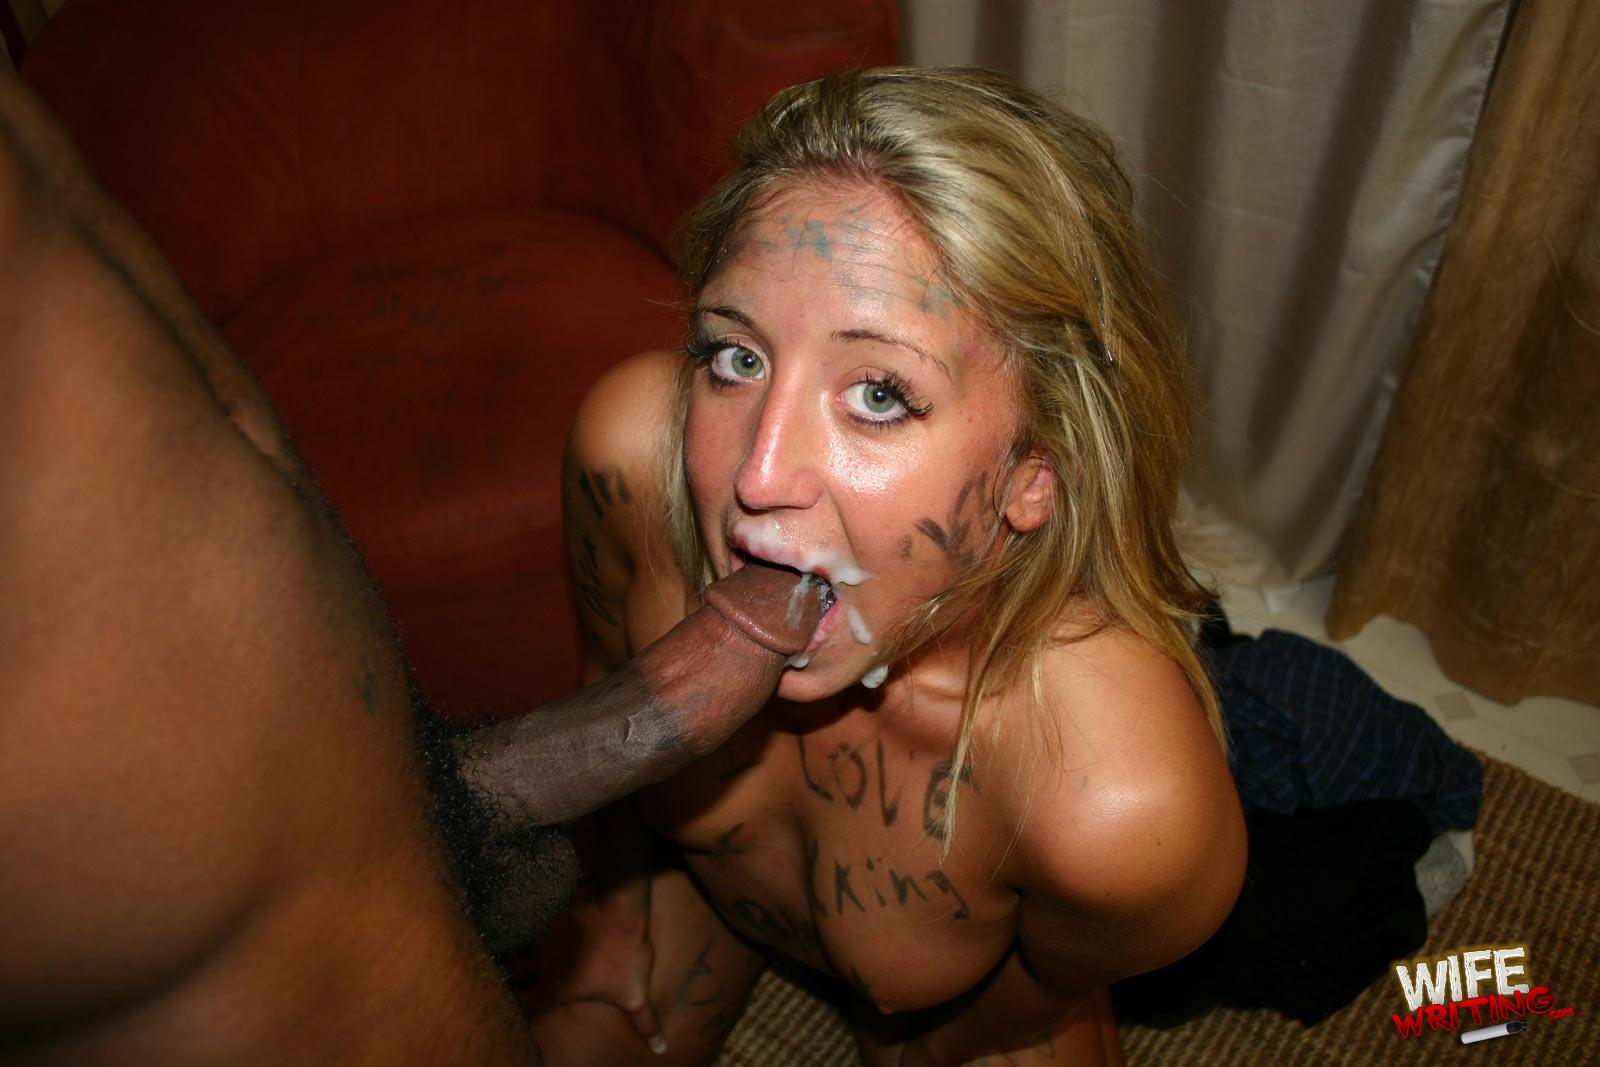 Ruff Deepthroat Sluts Nude Girls